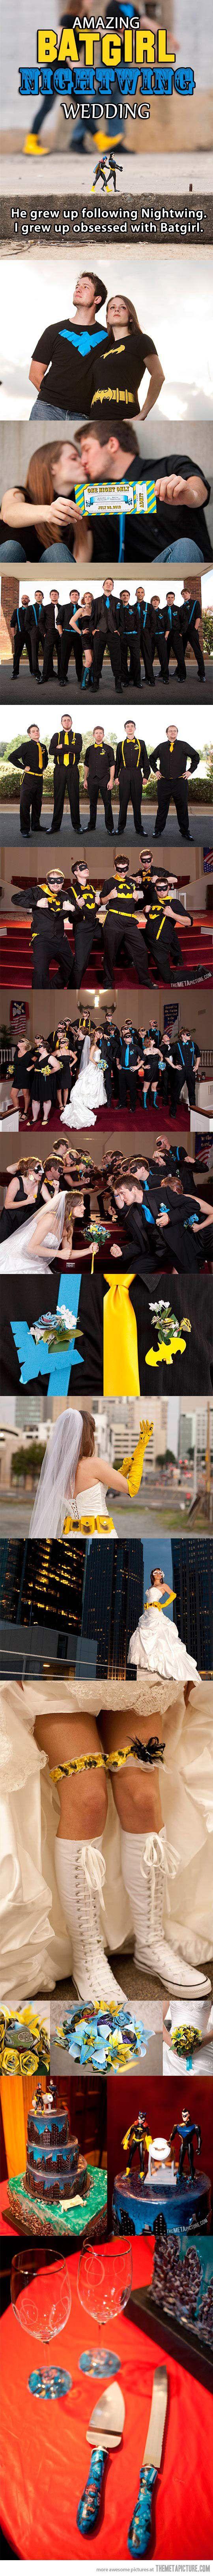 Batman themed wedding!!!! :D haha so cute:)